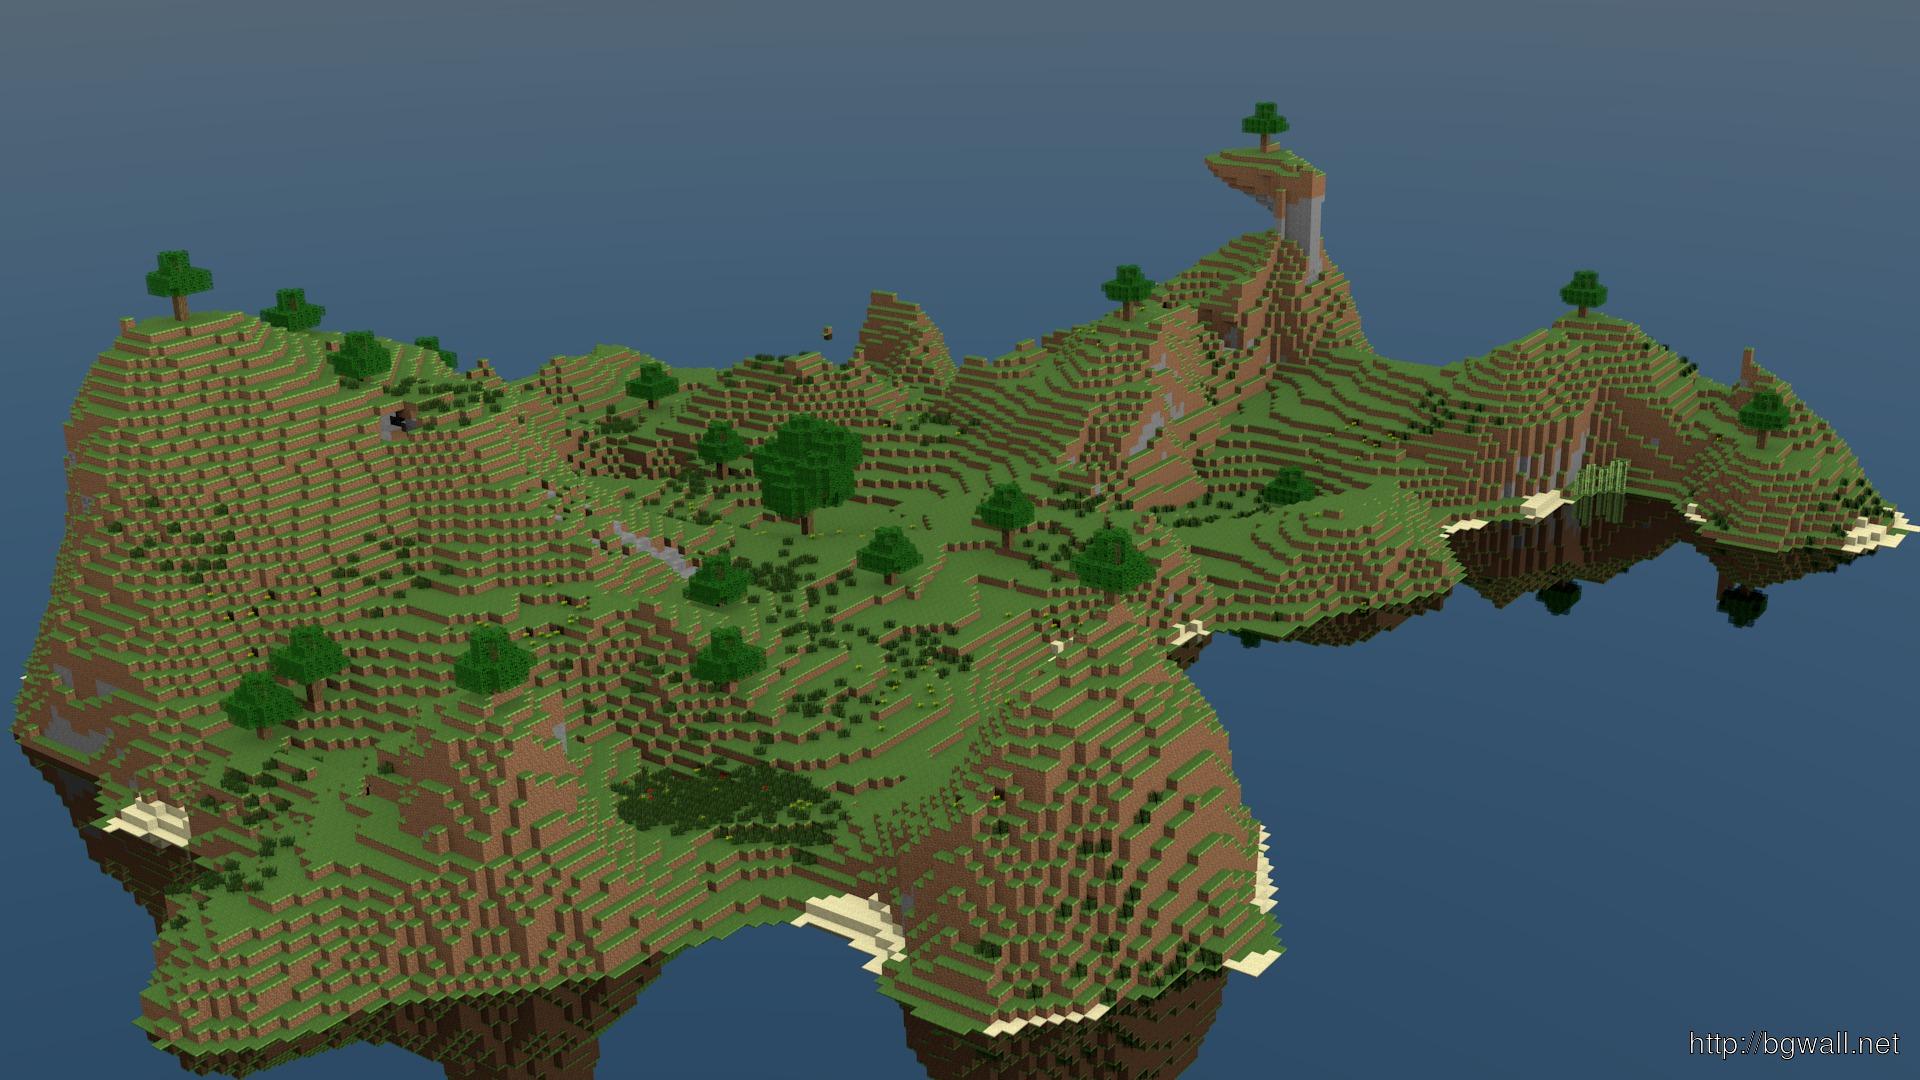 minecraft island wallpaper 1080p - photo #11